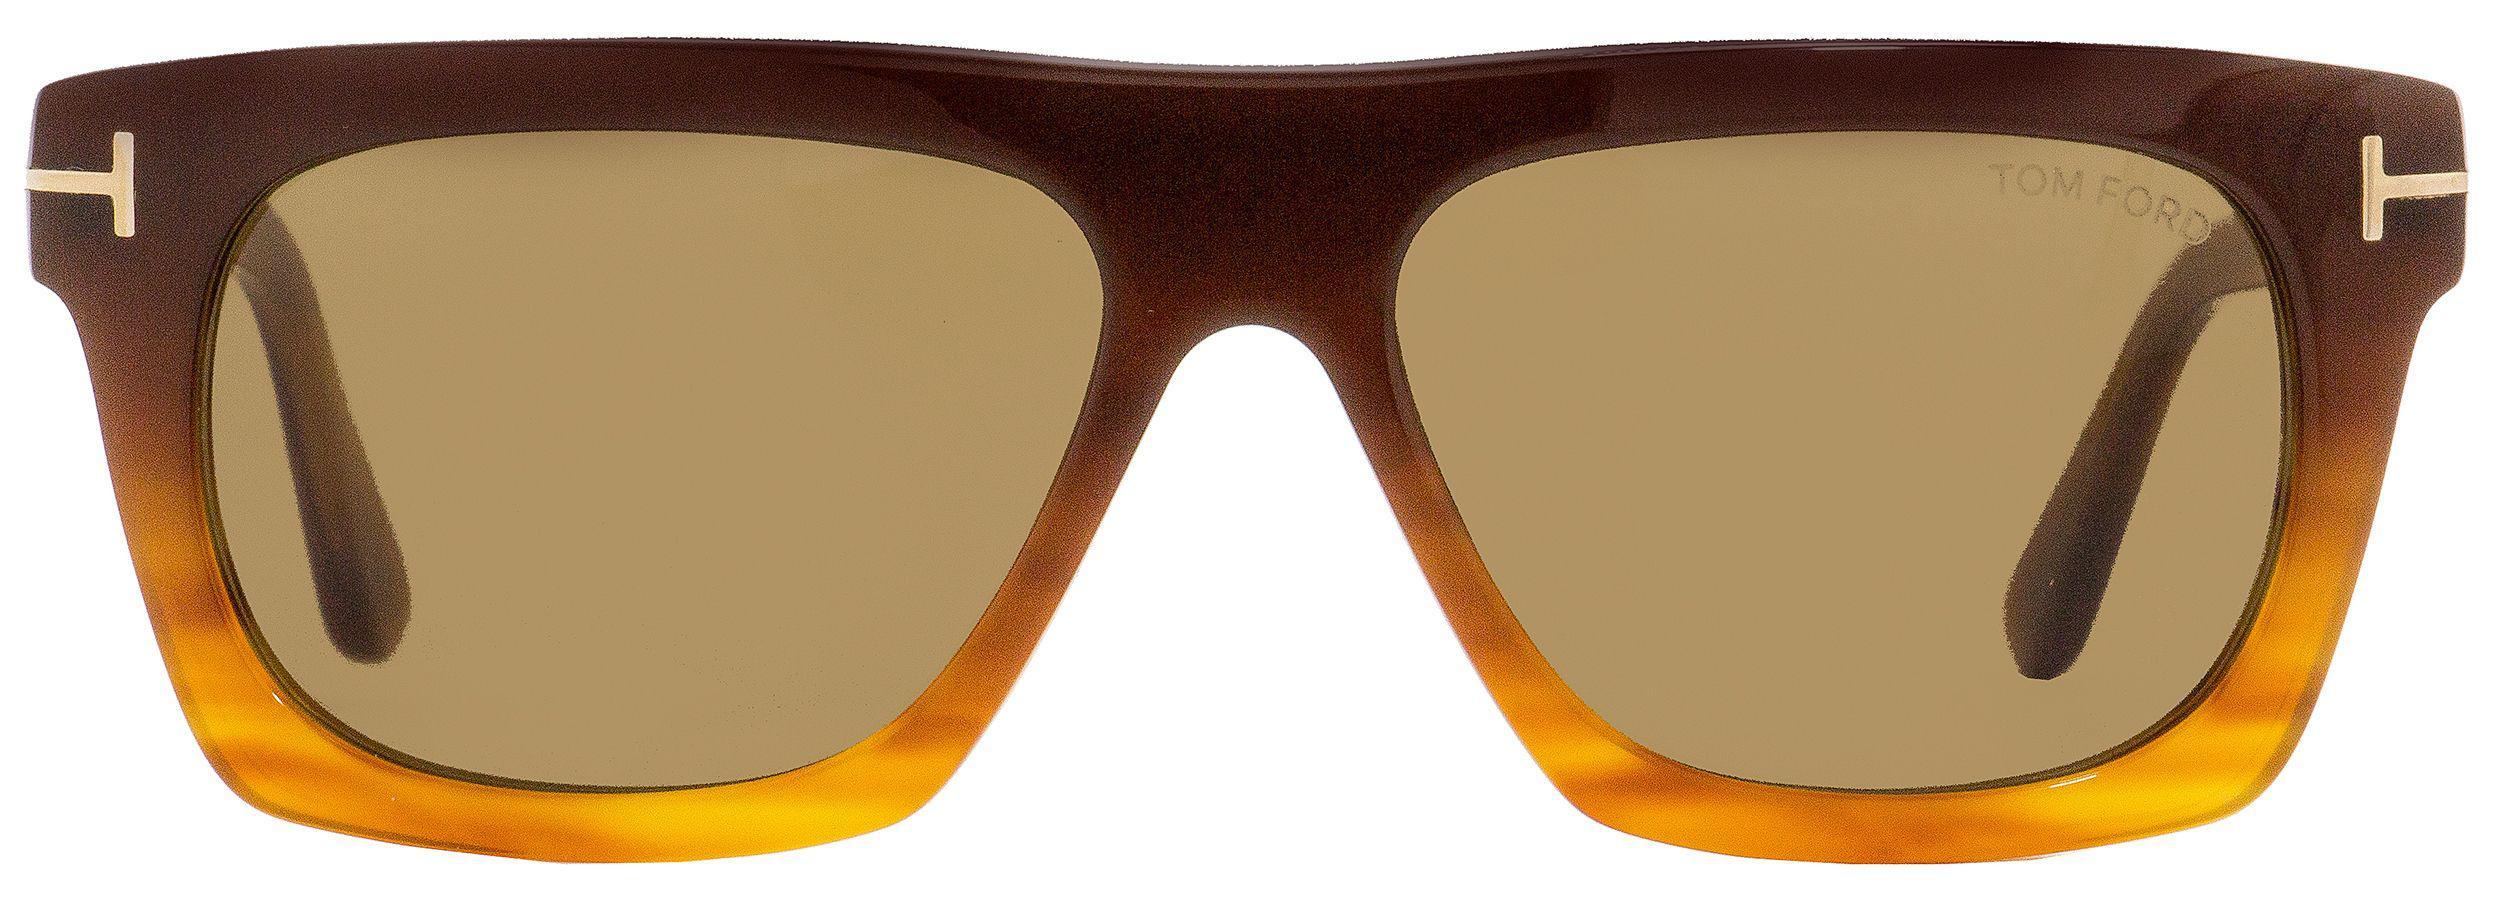 a6a9f99be6 Tom Ford - Rectangular Sunglasses Tf592 Ernesto-02 50e Brown blonde Havana  55mm Ft0592. View fullscreen